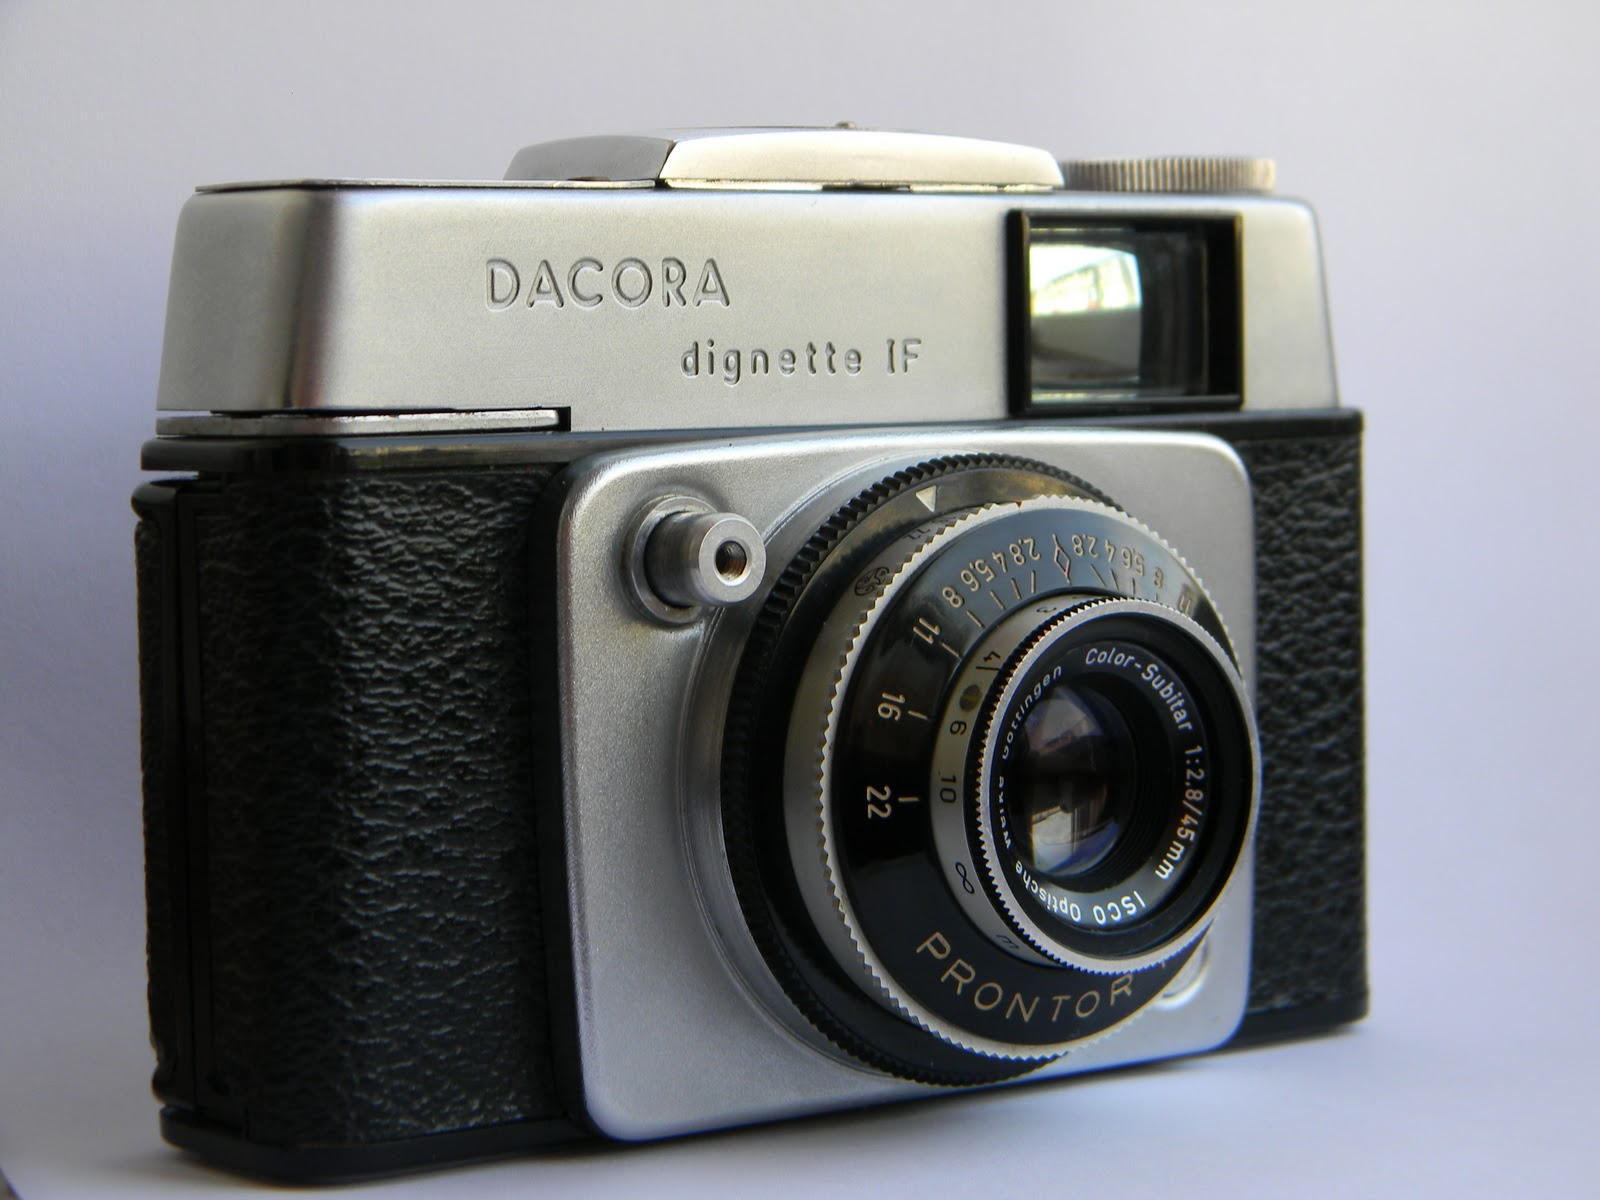 Dacora Dignette IF | Camerapedia | FANDOM powered by Wikia